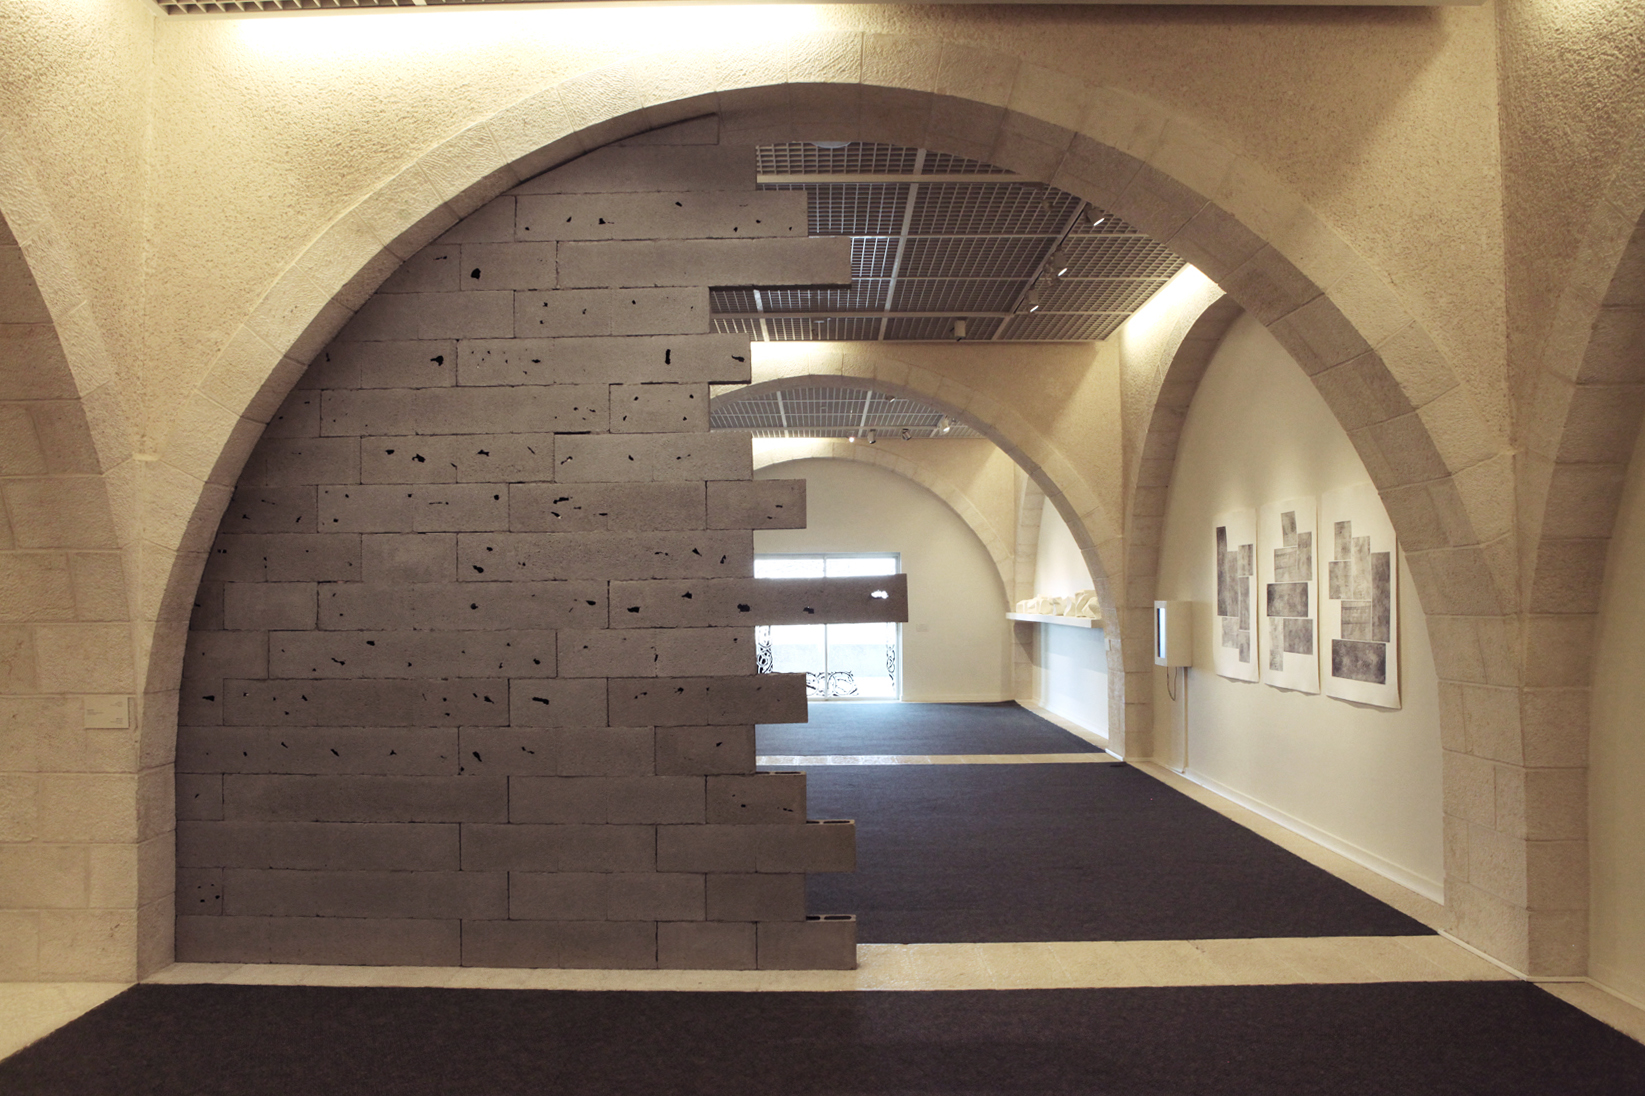 """Brick Wall #3"" on display at Mormon University, Jerusalem.Photo by Doron Kuperman, courtesy of the artist."